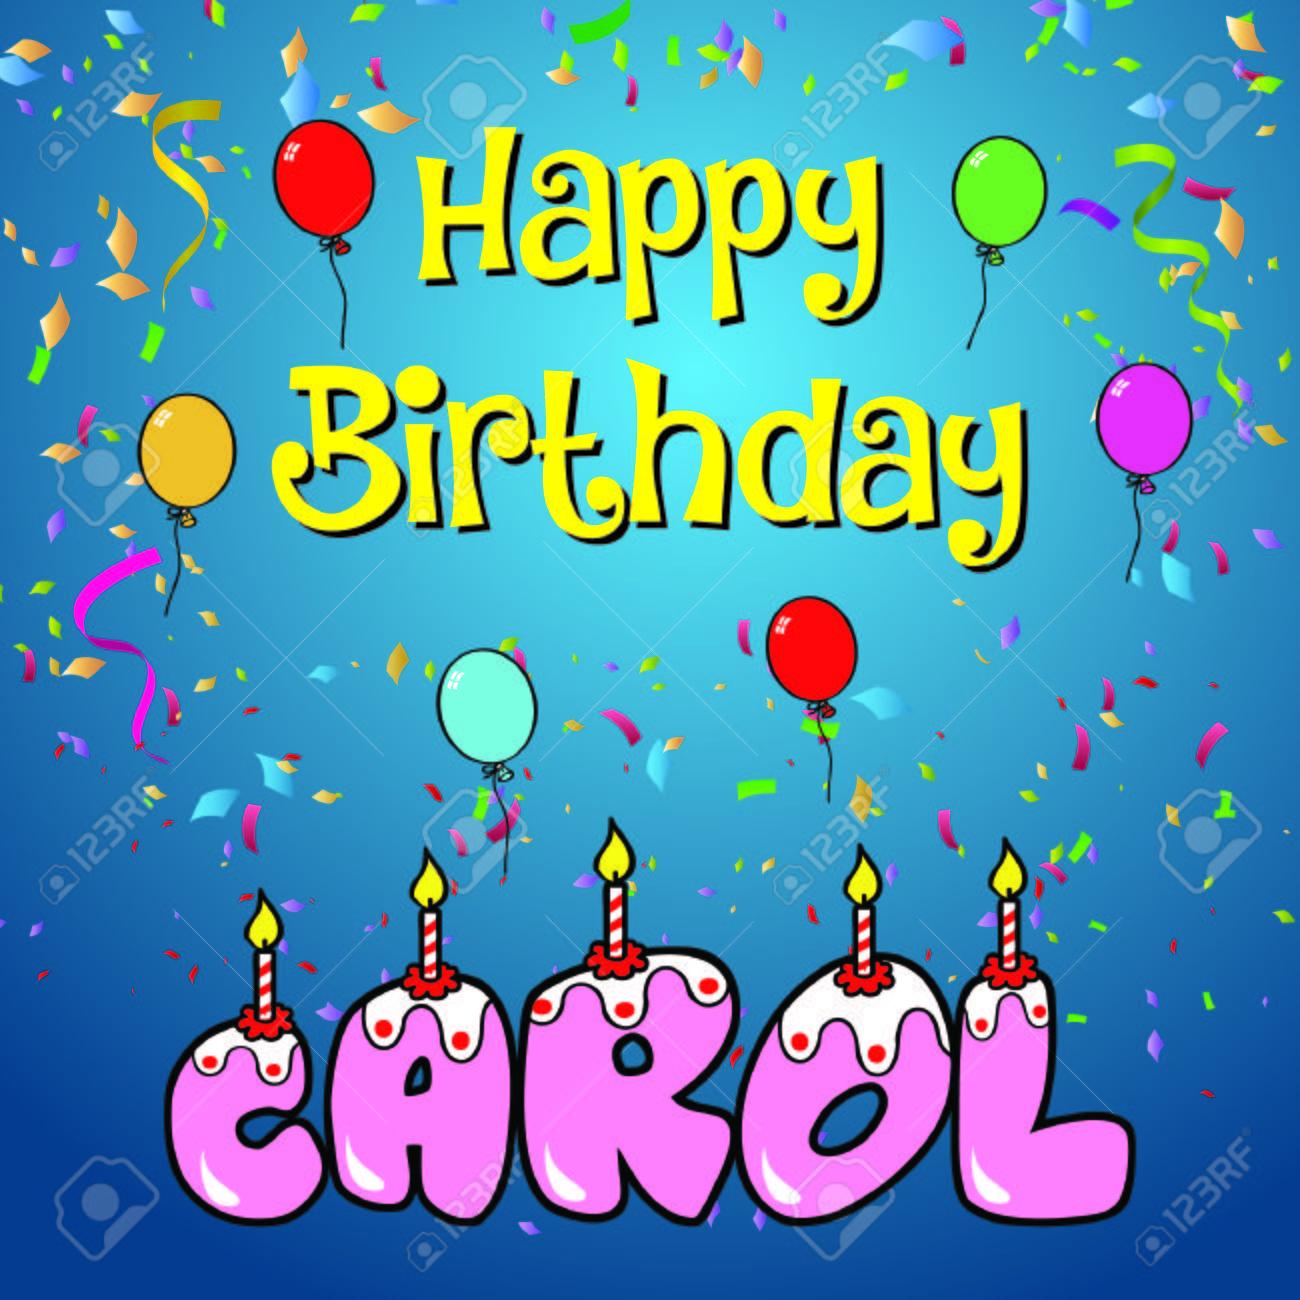 Happy Birthday Carol Royalty Free Cliparts Vectors And Stock Illustration Image 76484818